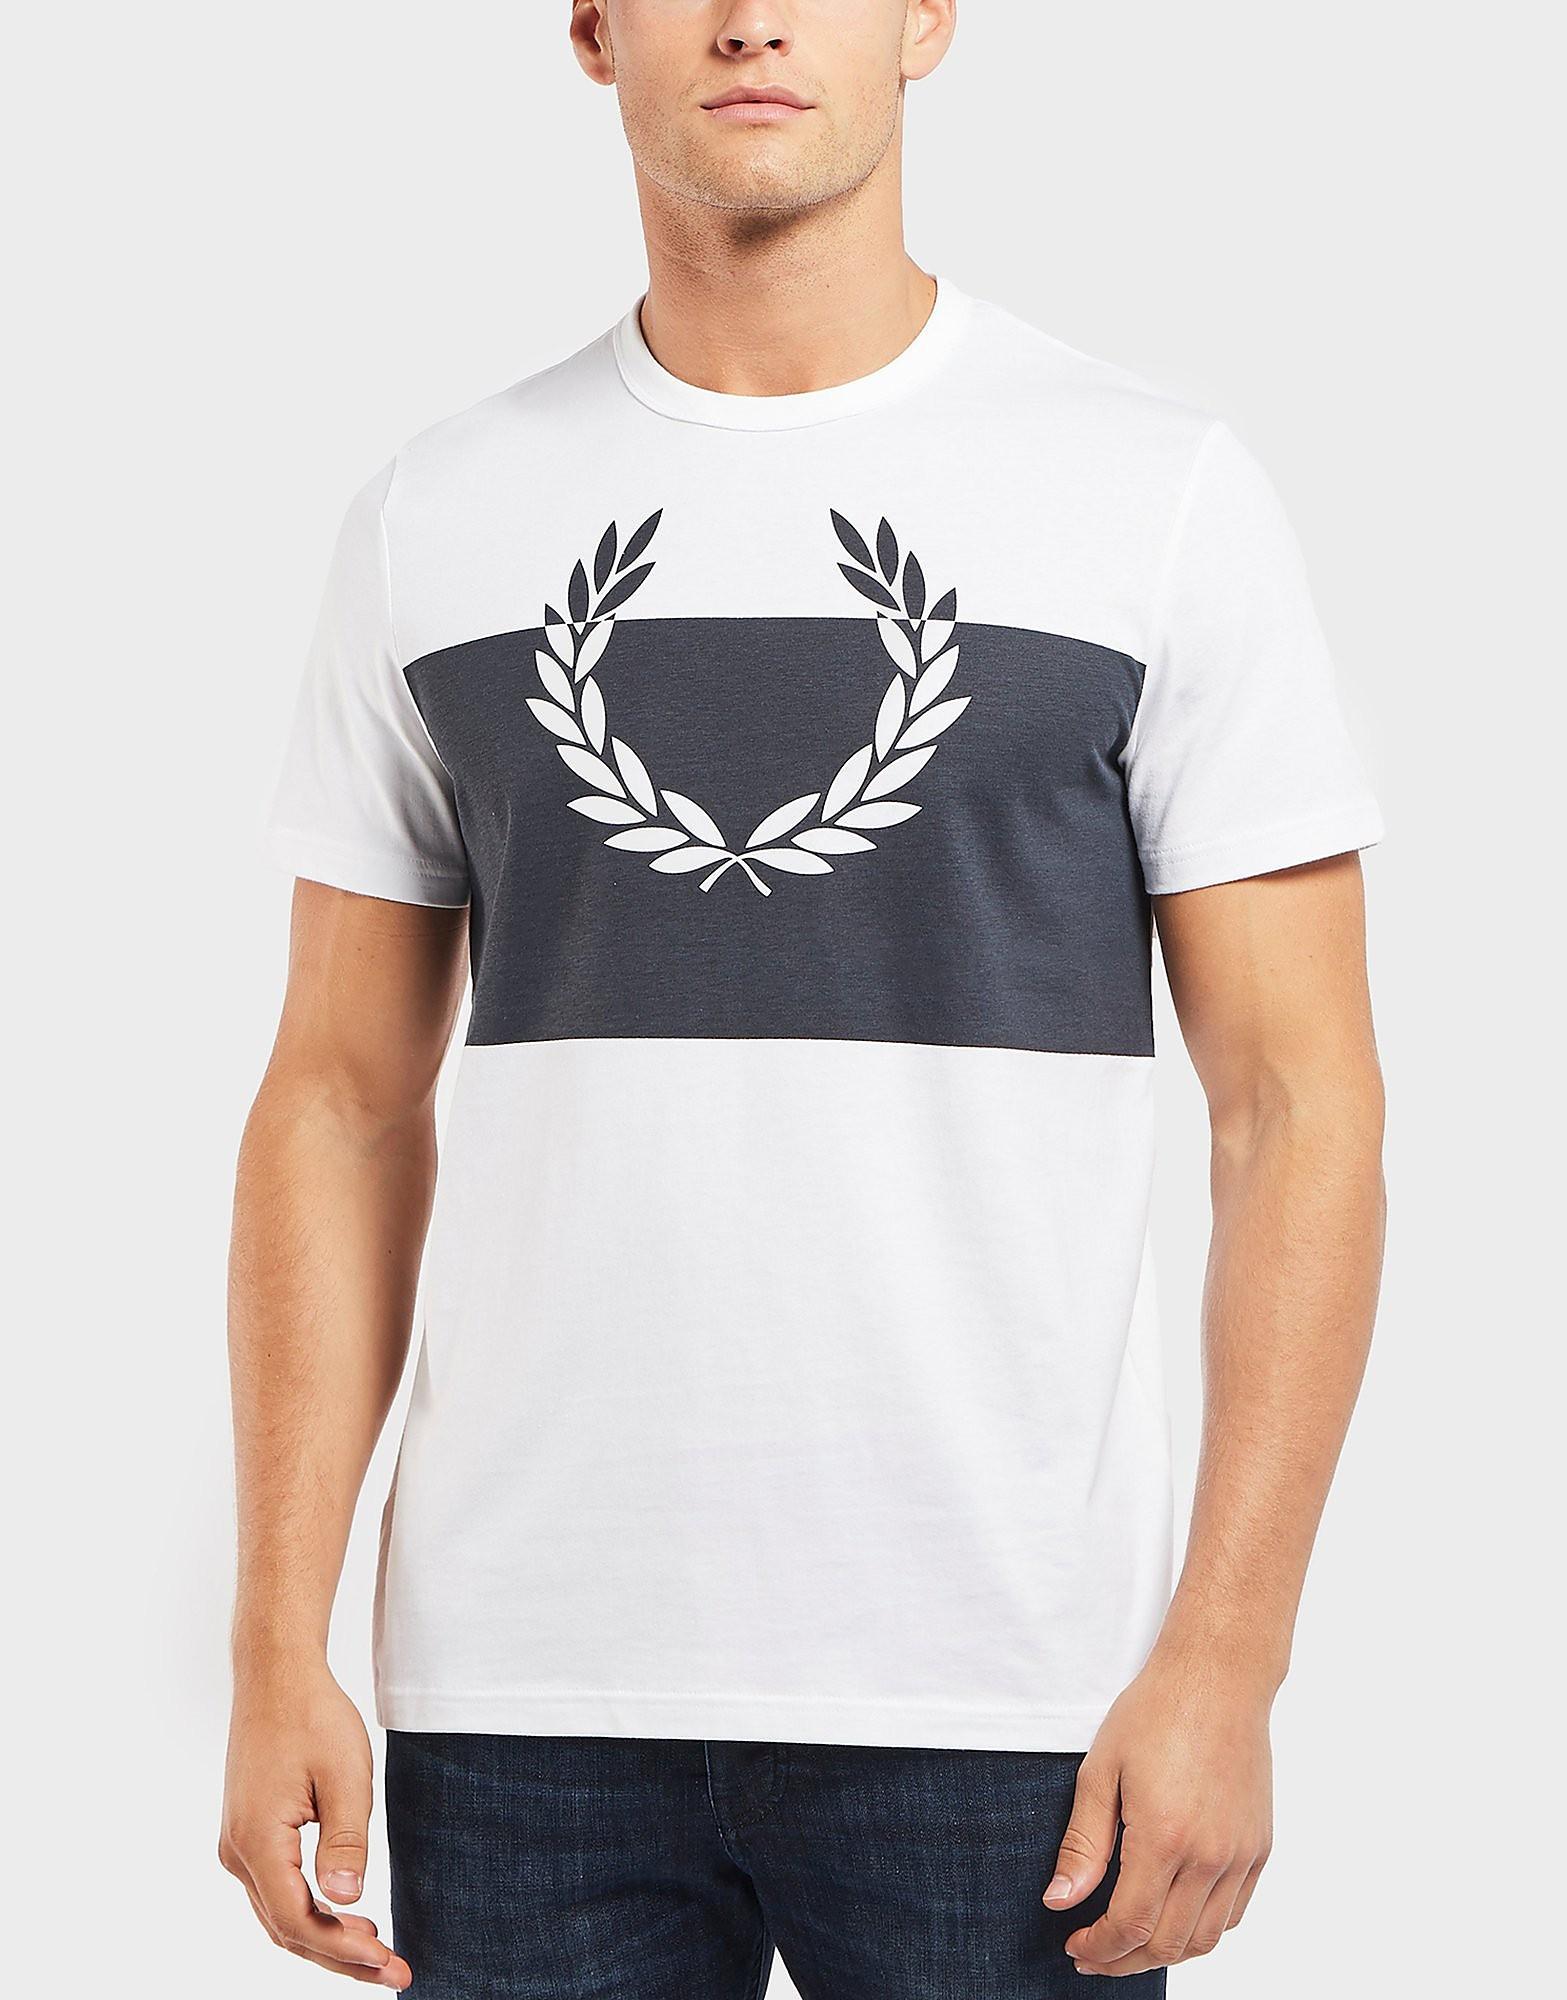 Fred Perry Laurel Block Short Sleeve T-Shirt